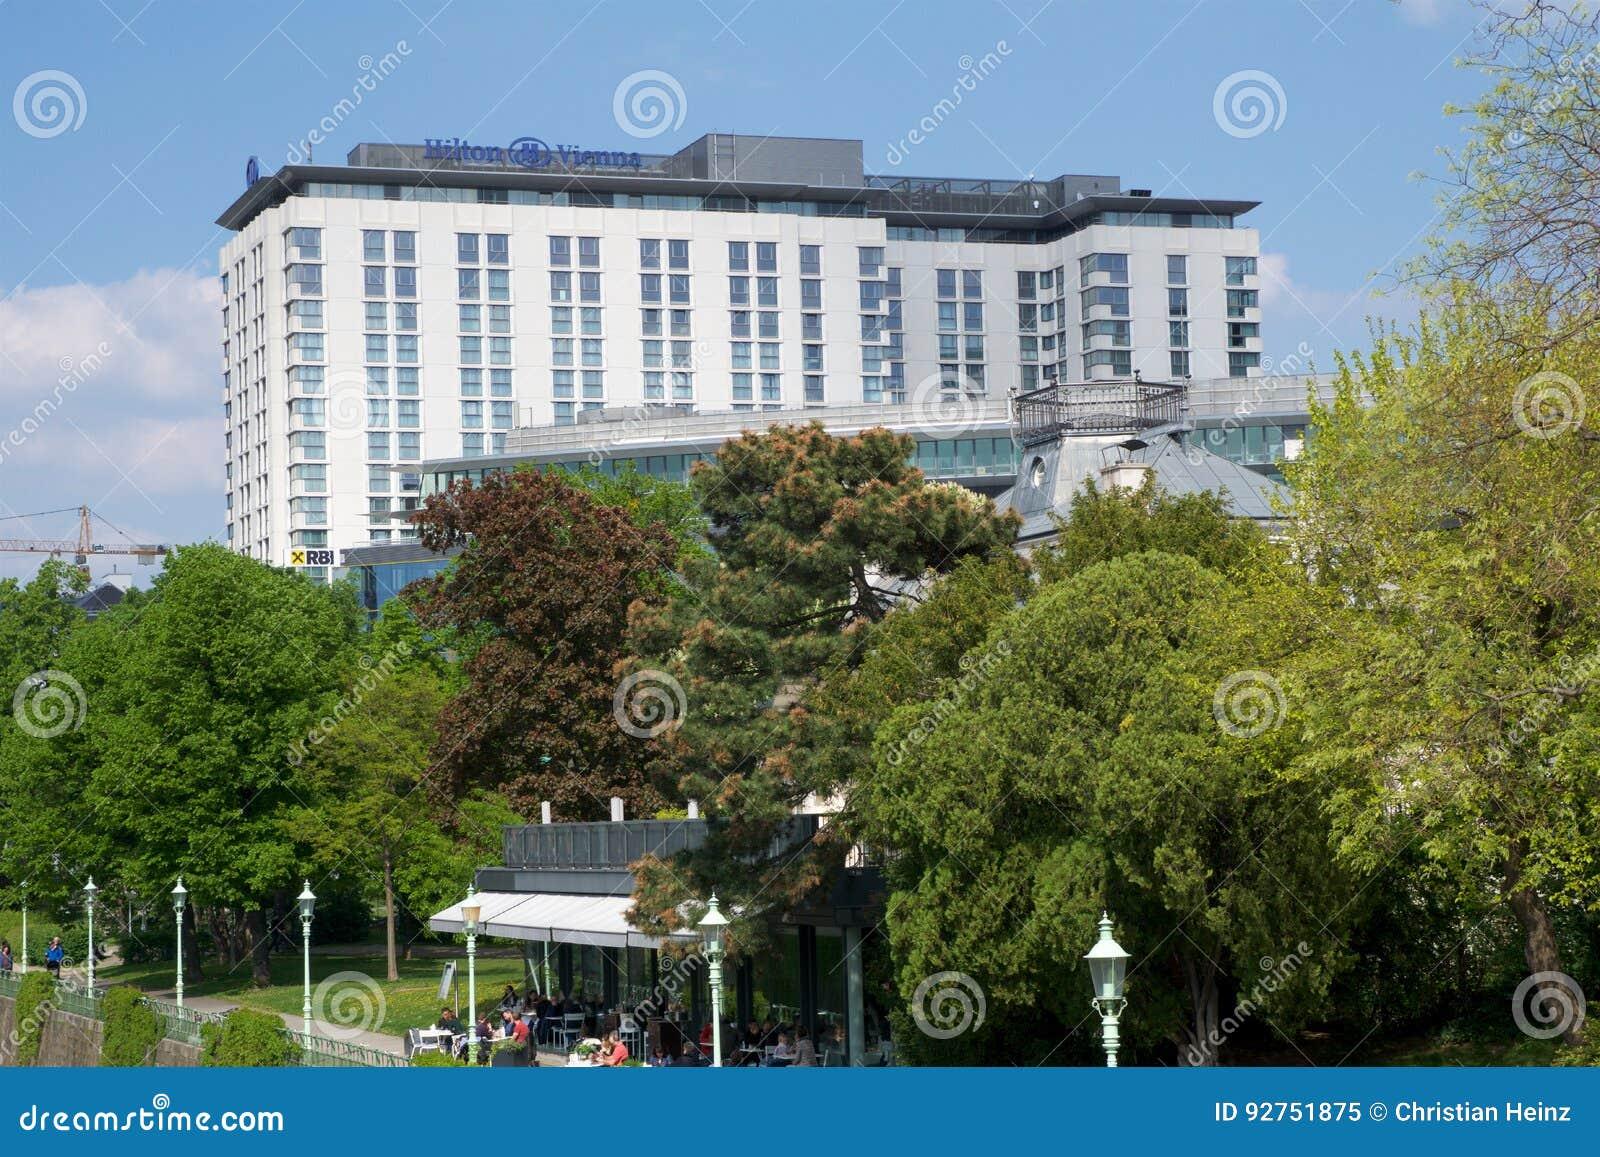 Vienna Austria Apr 30th 2017 Outside View Of The Hilton Vienna